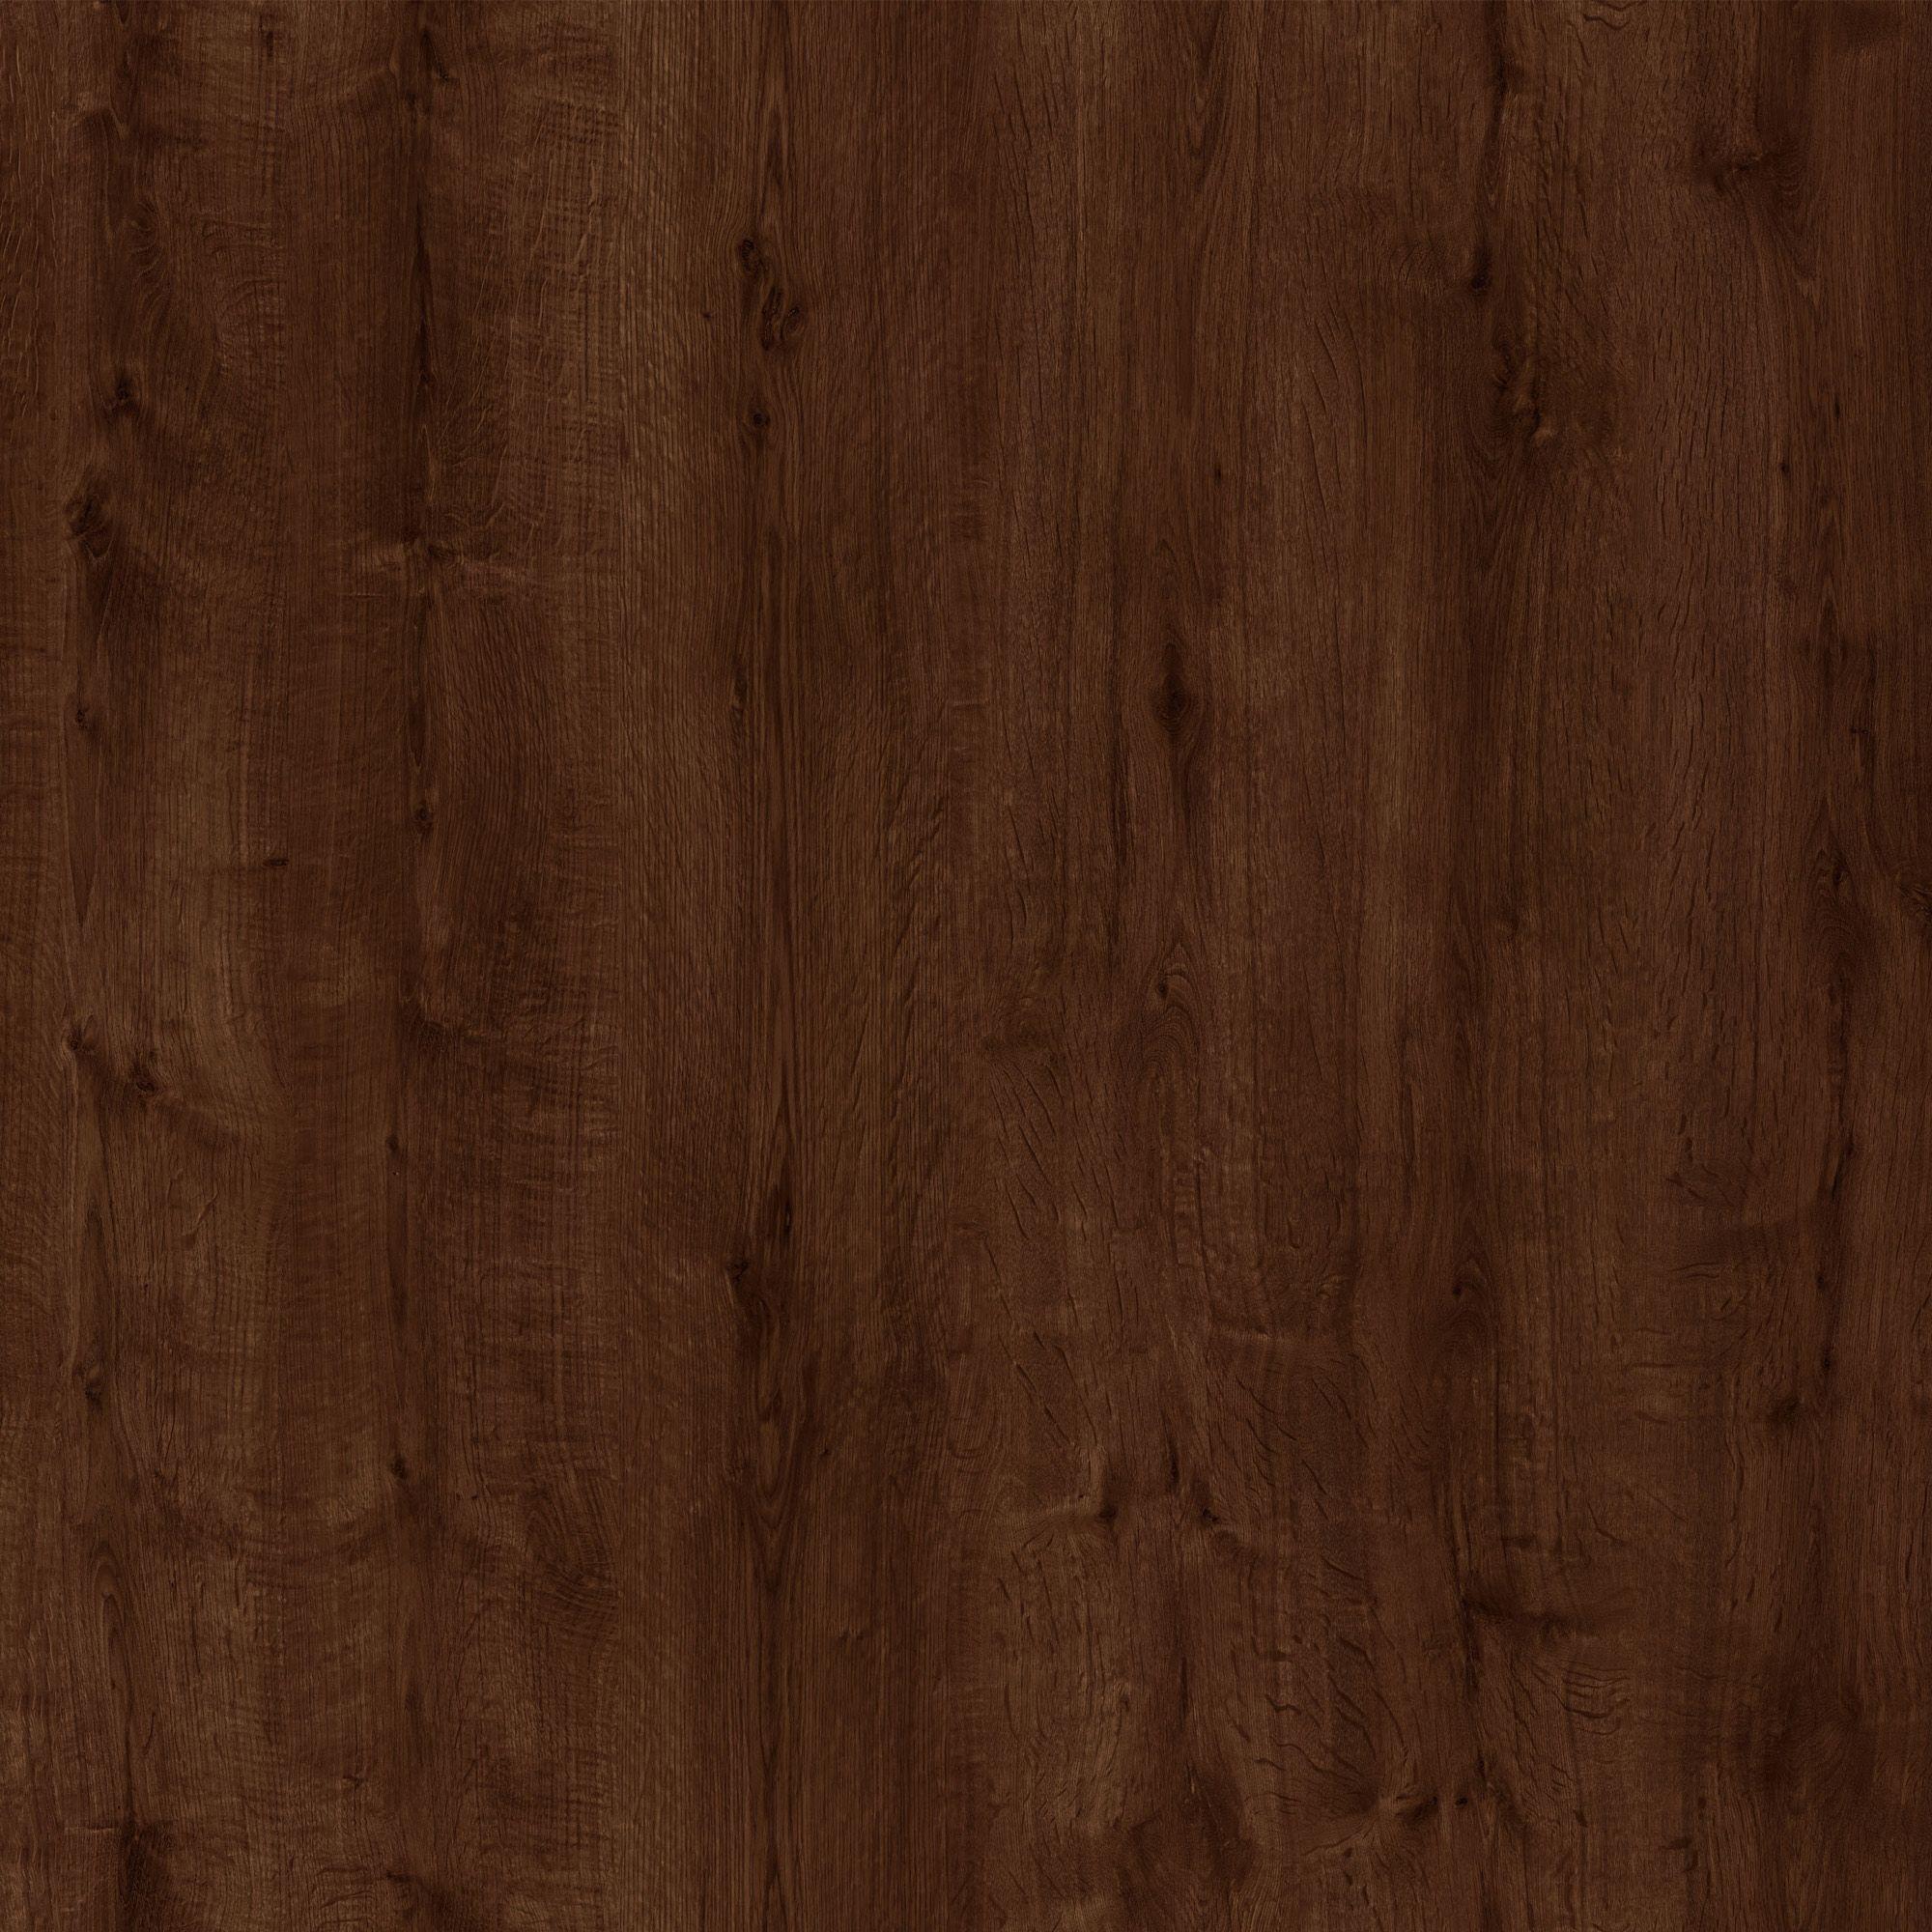 dark laminate flooring concertino prestige dark oak effect laminate flooring 1.48 m² pack |  departments UAONUDC